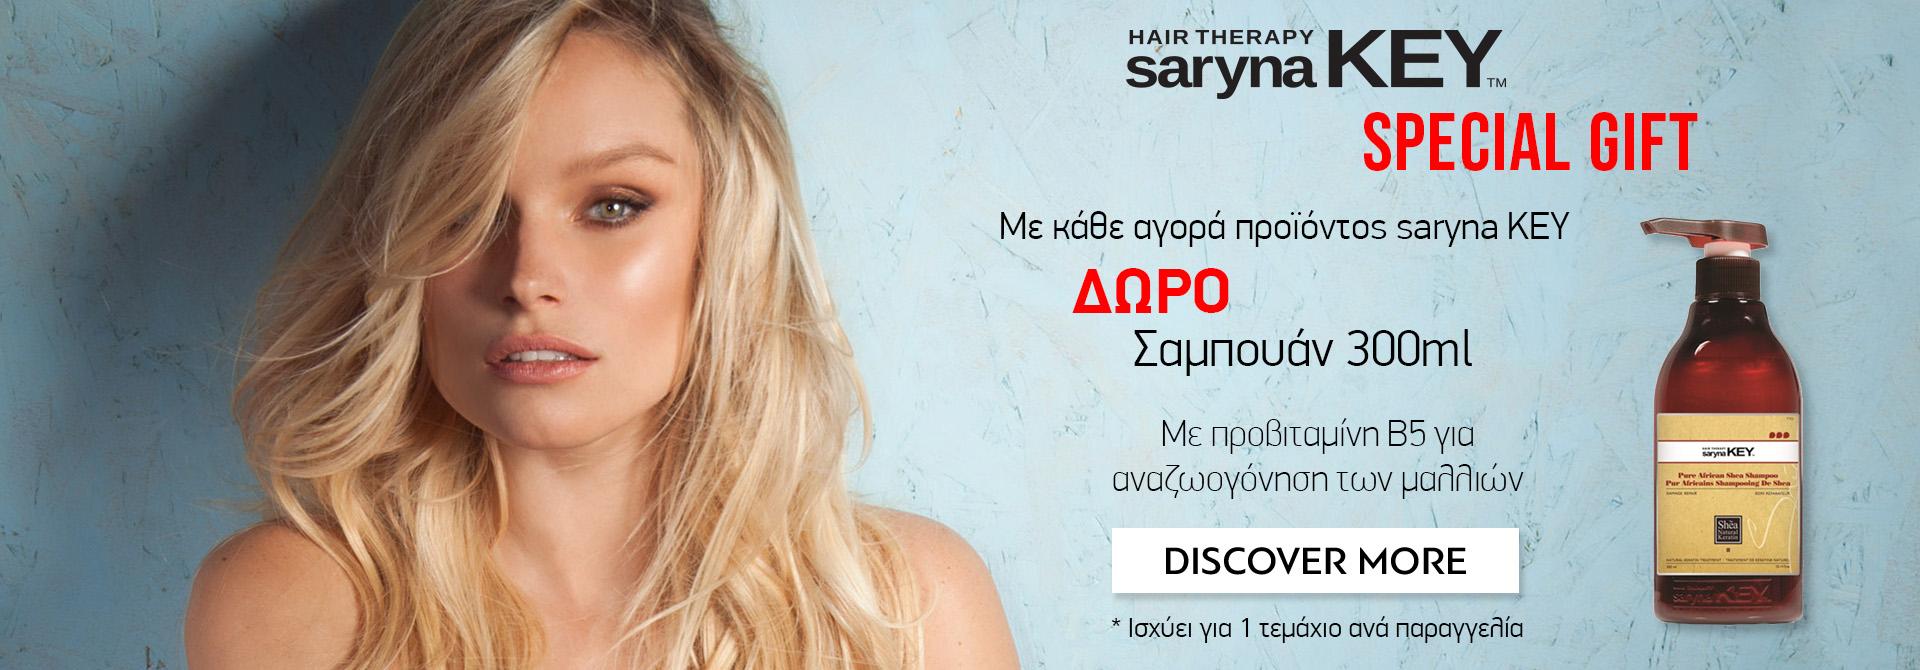 saryna key δωρο σαμπουαν letif